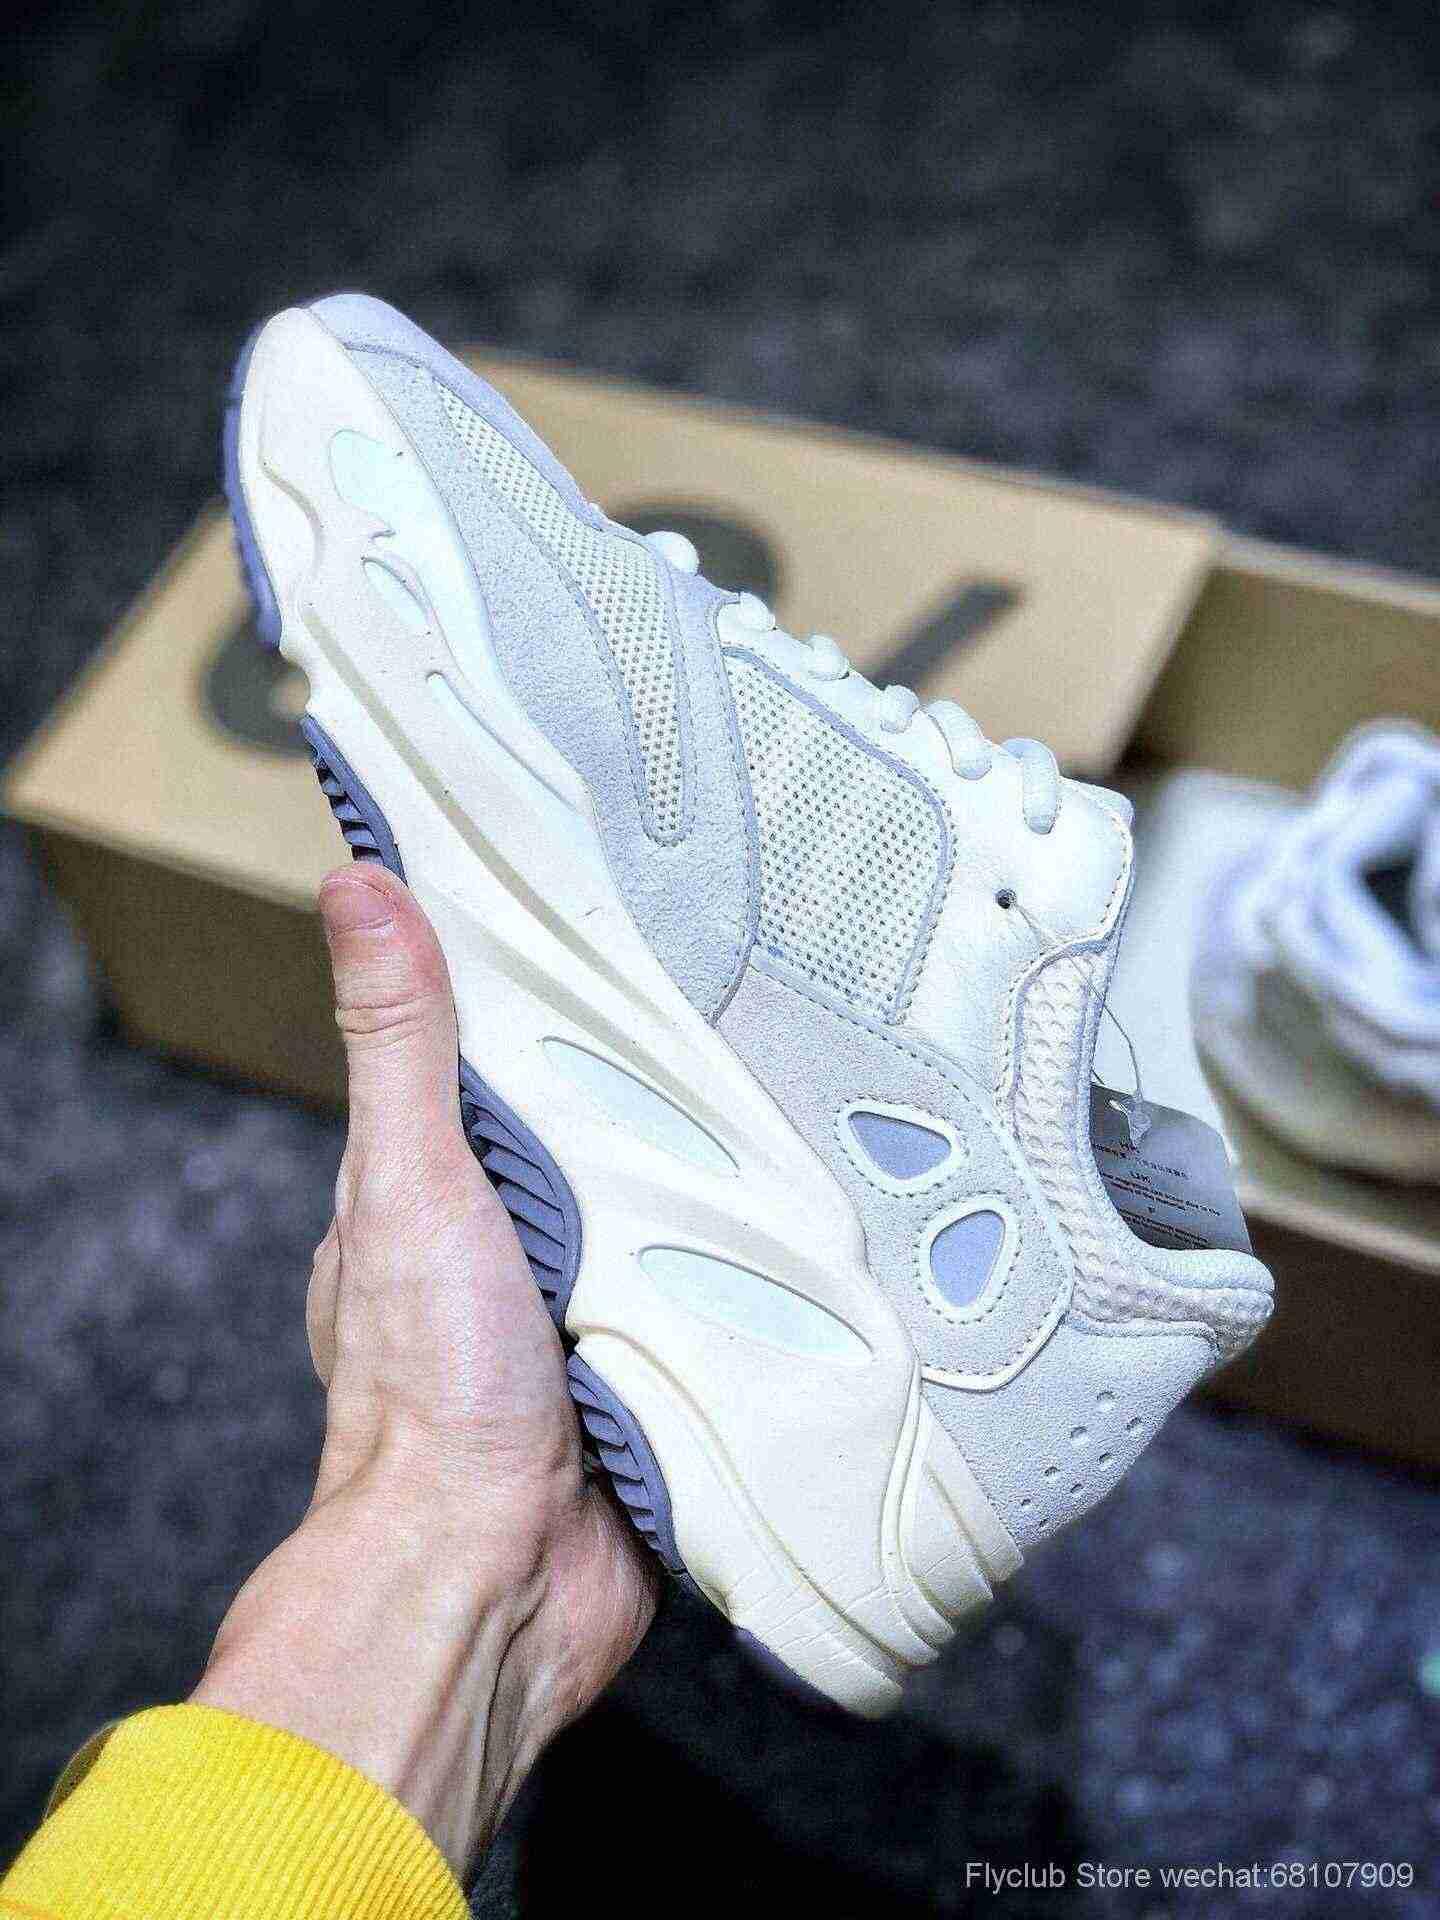 "Adidas Yeezy 700 Runner ""Analog""配色"